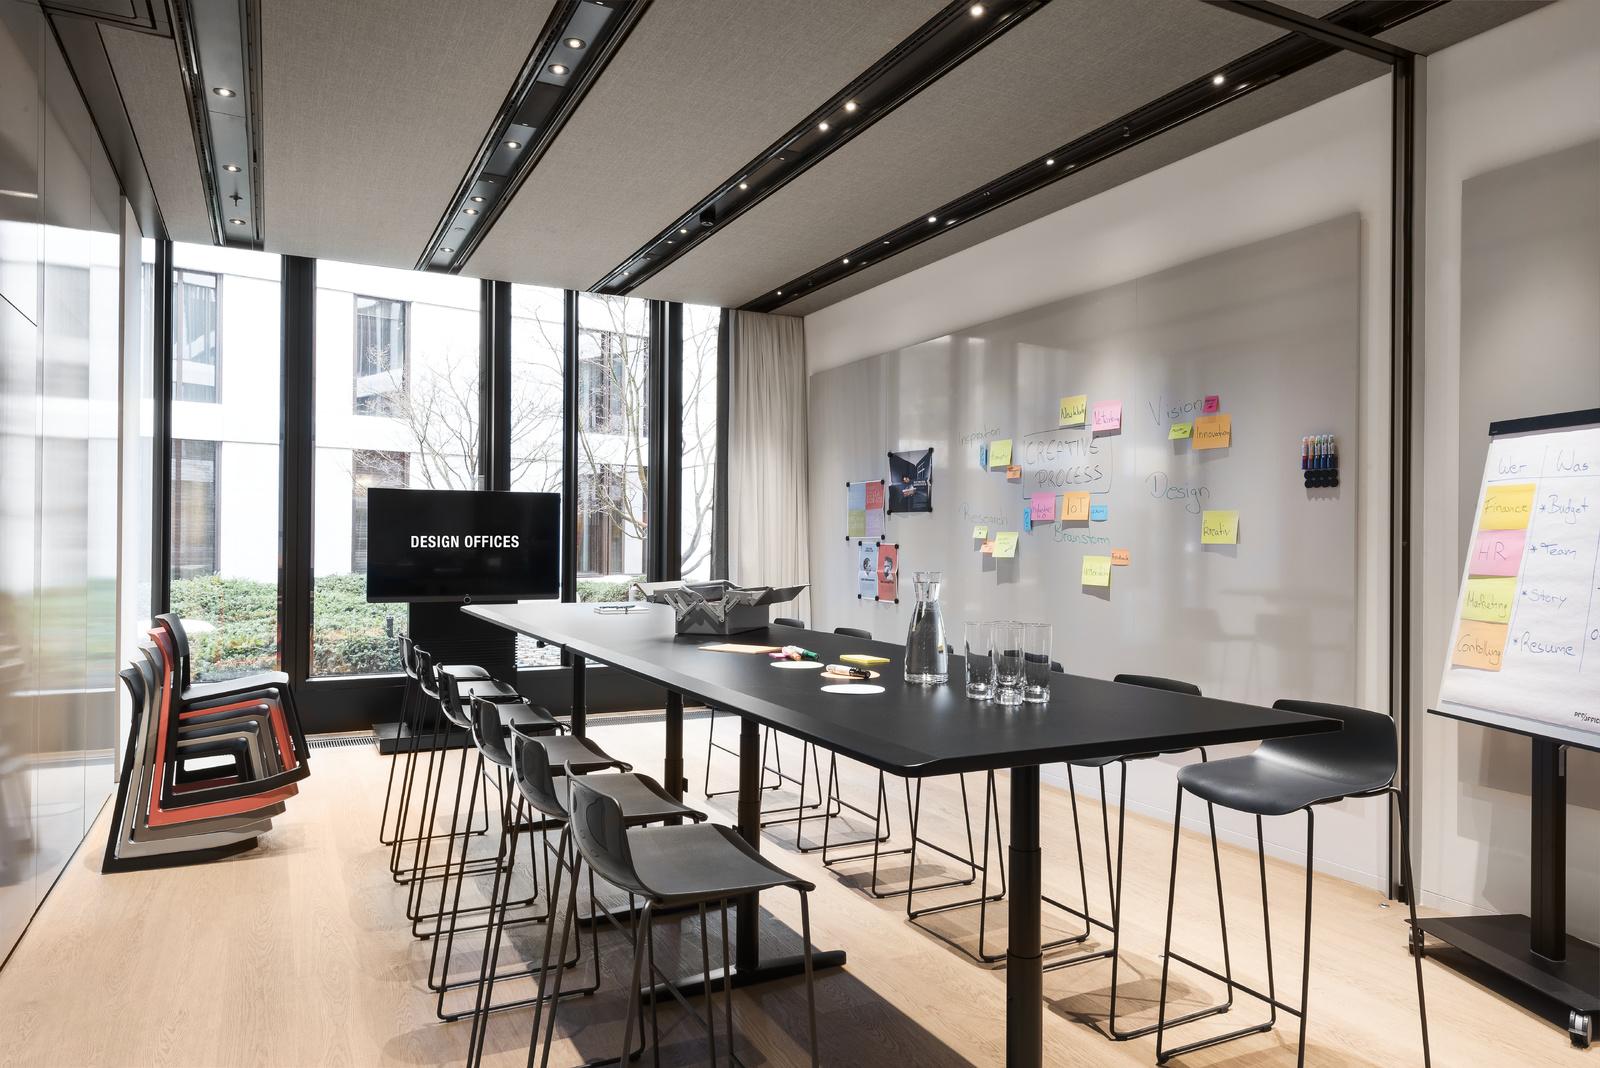 design offices m nchen nove eventlocation fiylo. Black Bedroom Furniture Sets. Home Design Ideas